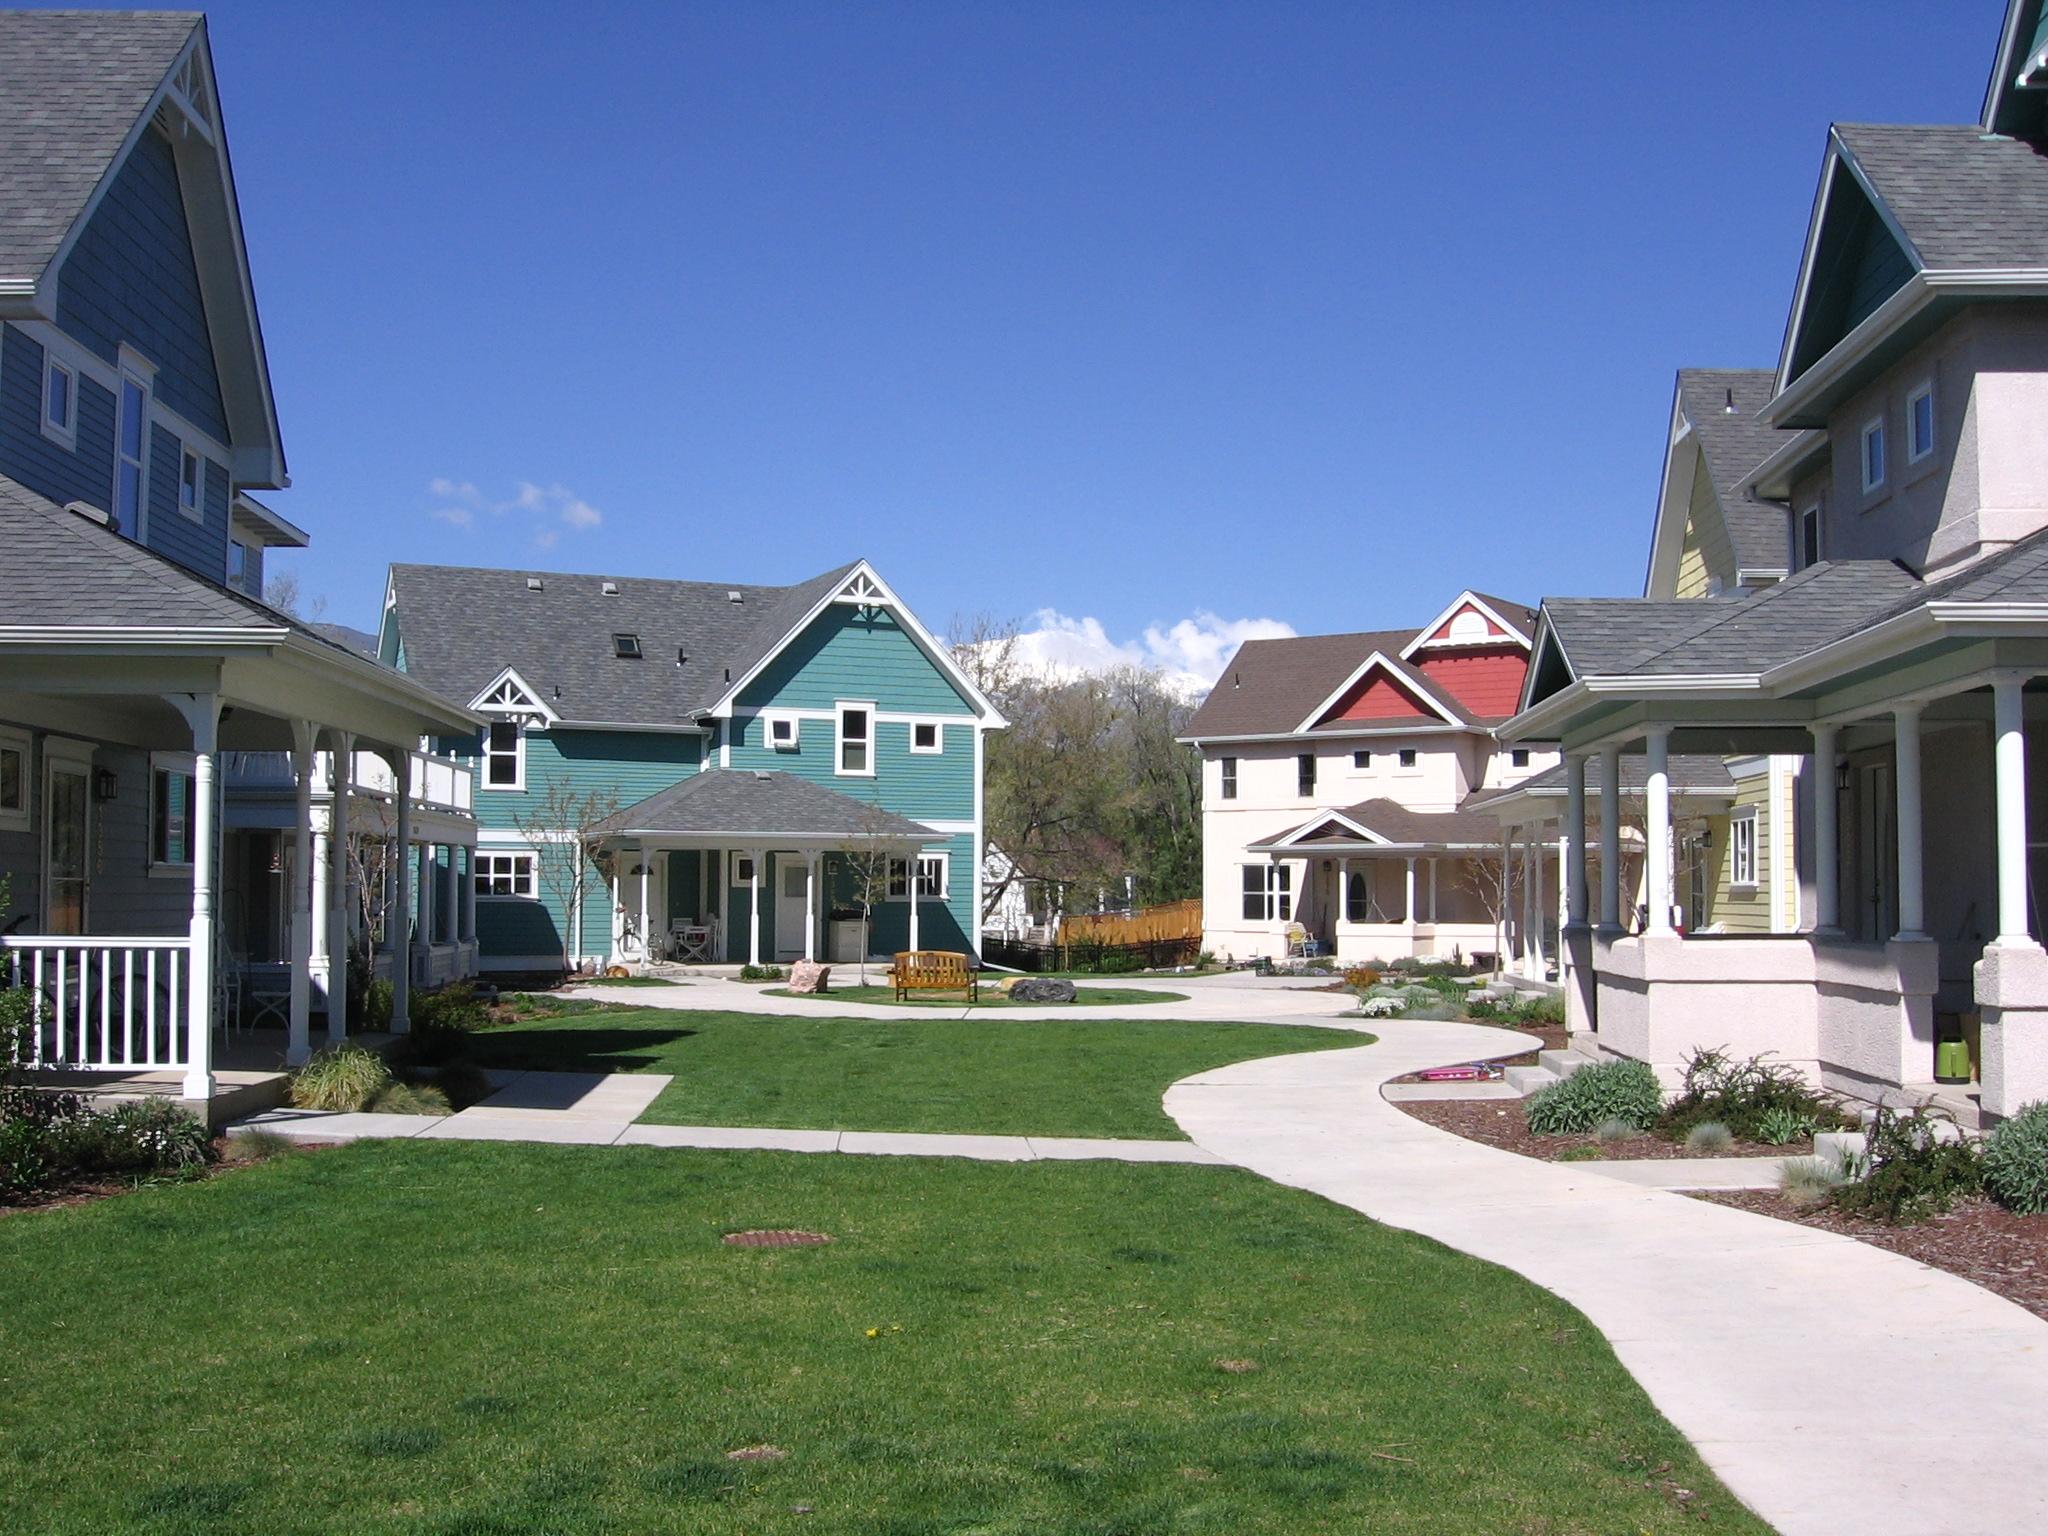 Casa Verde Commons